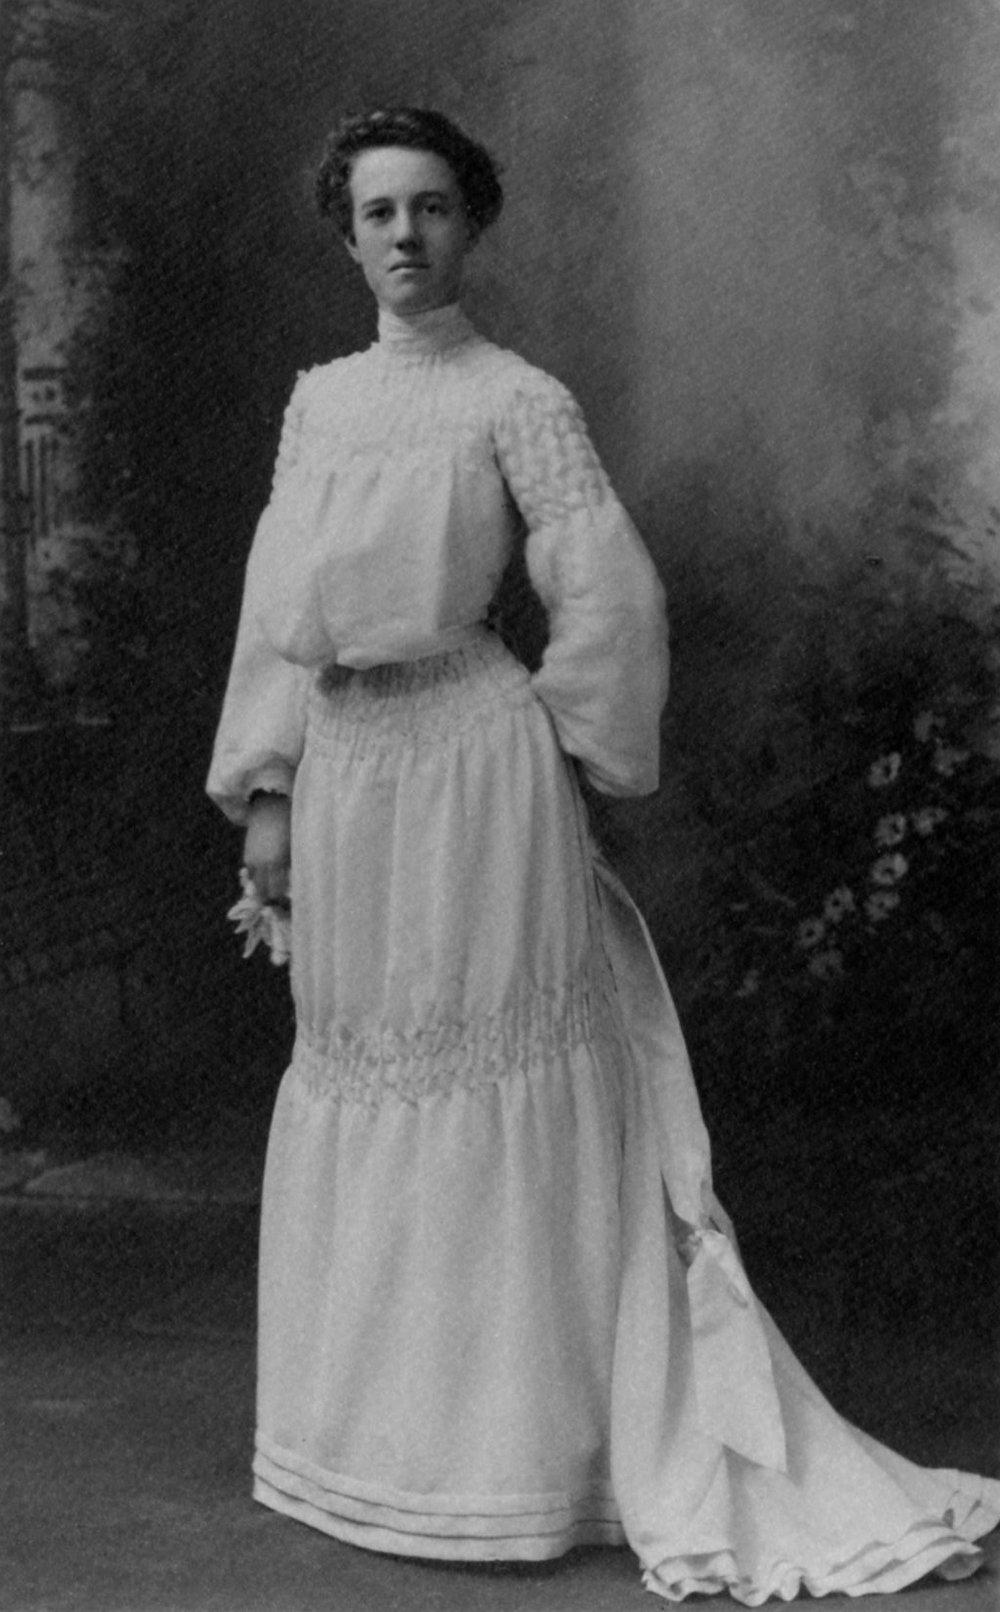 Jessie Hill Thomson Hunt at her wedding in 1903